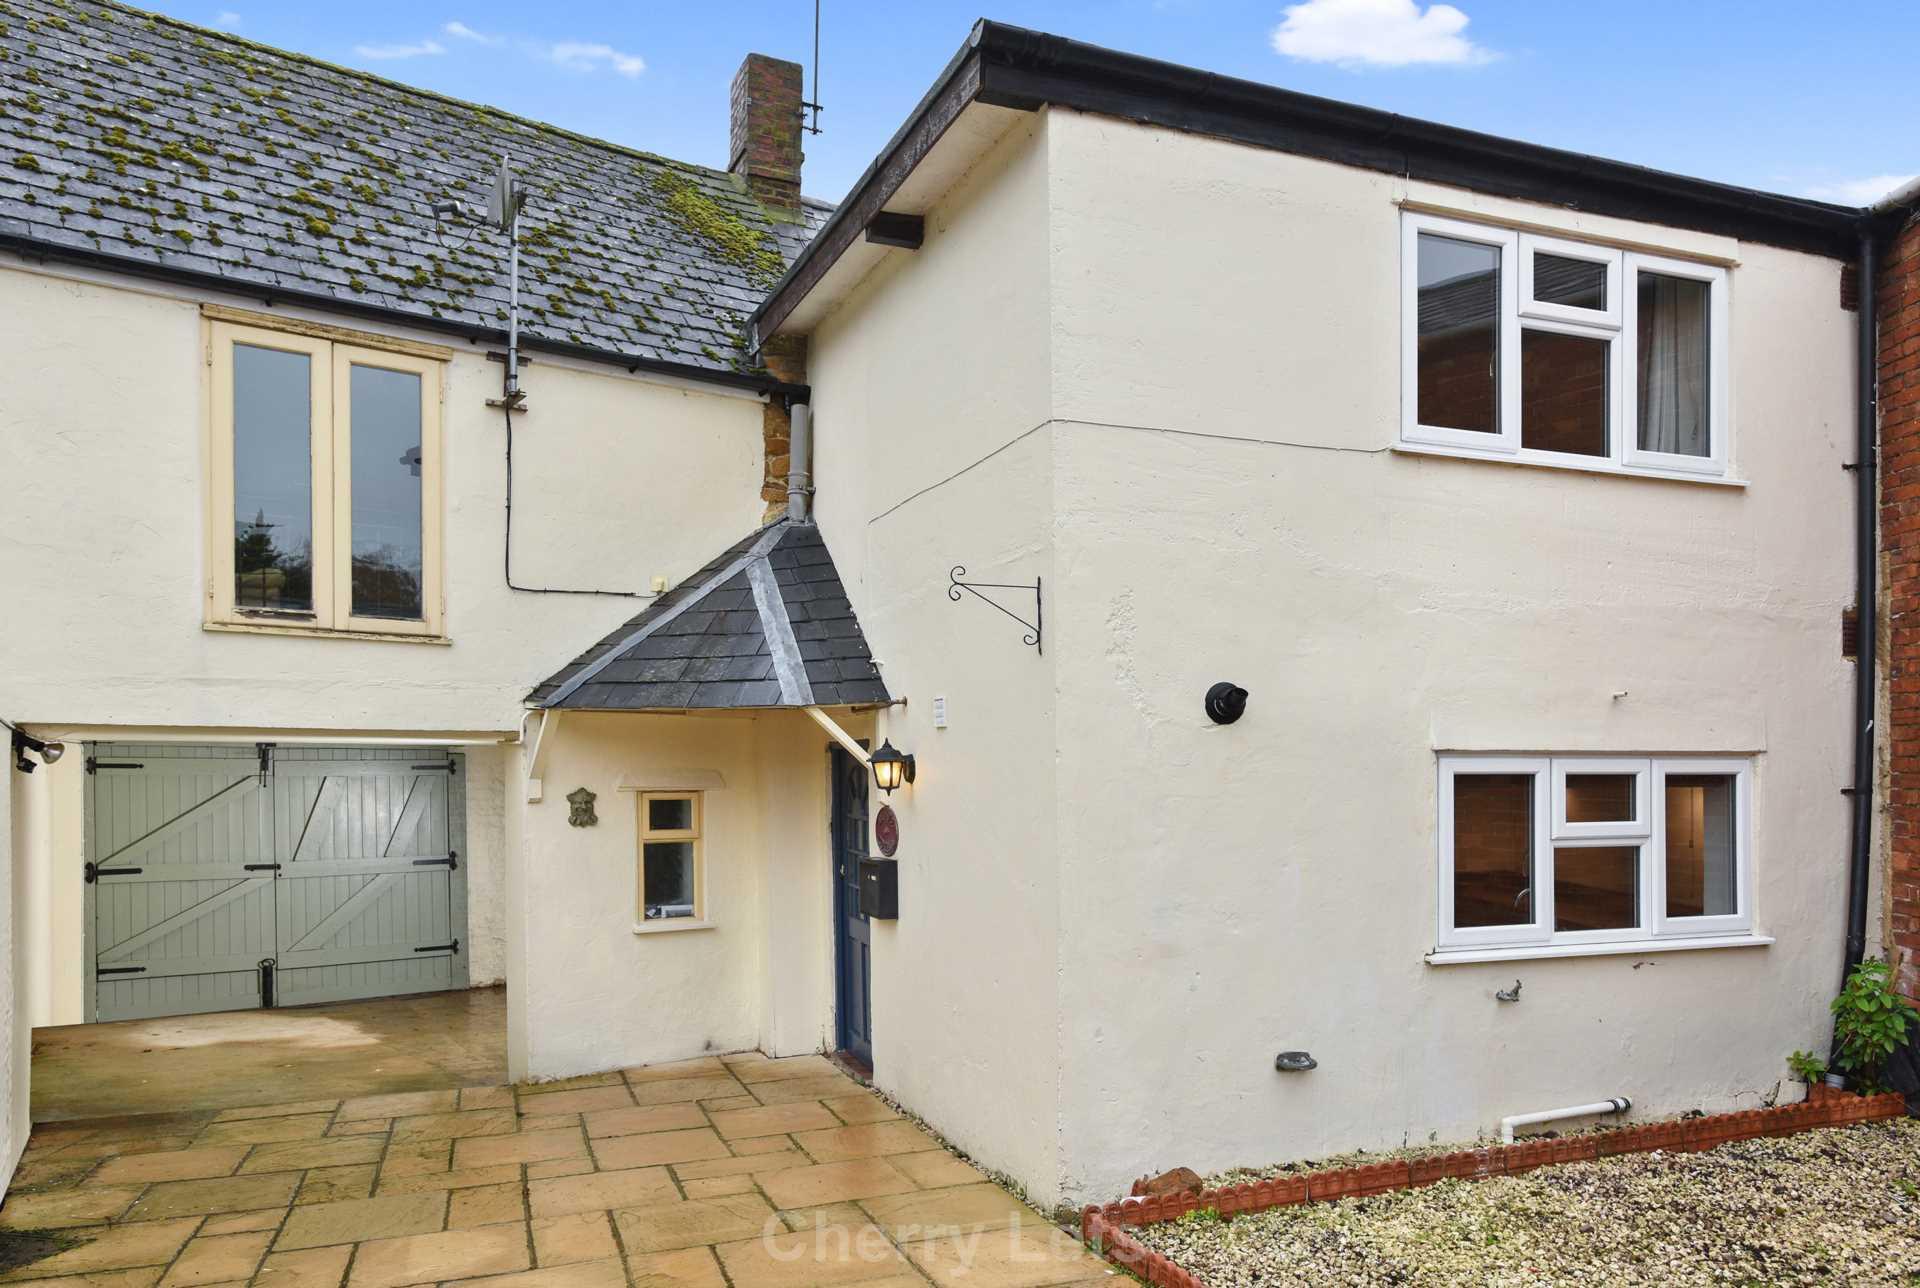 2 bed cottage to rent in Thimble Cottage, Market Place, Deddington, Banbury  - Property Image 10